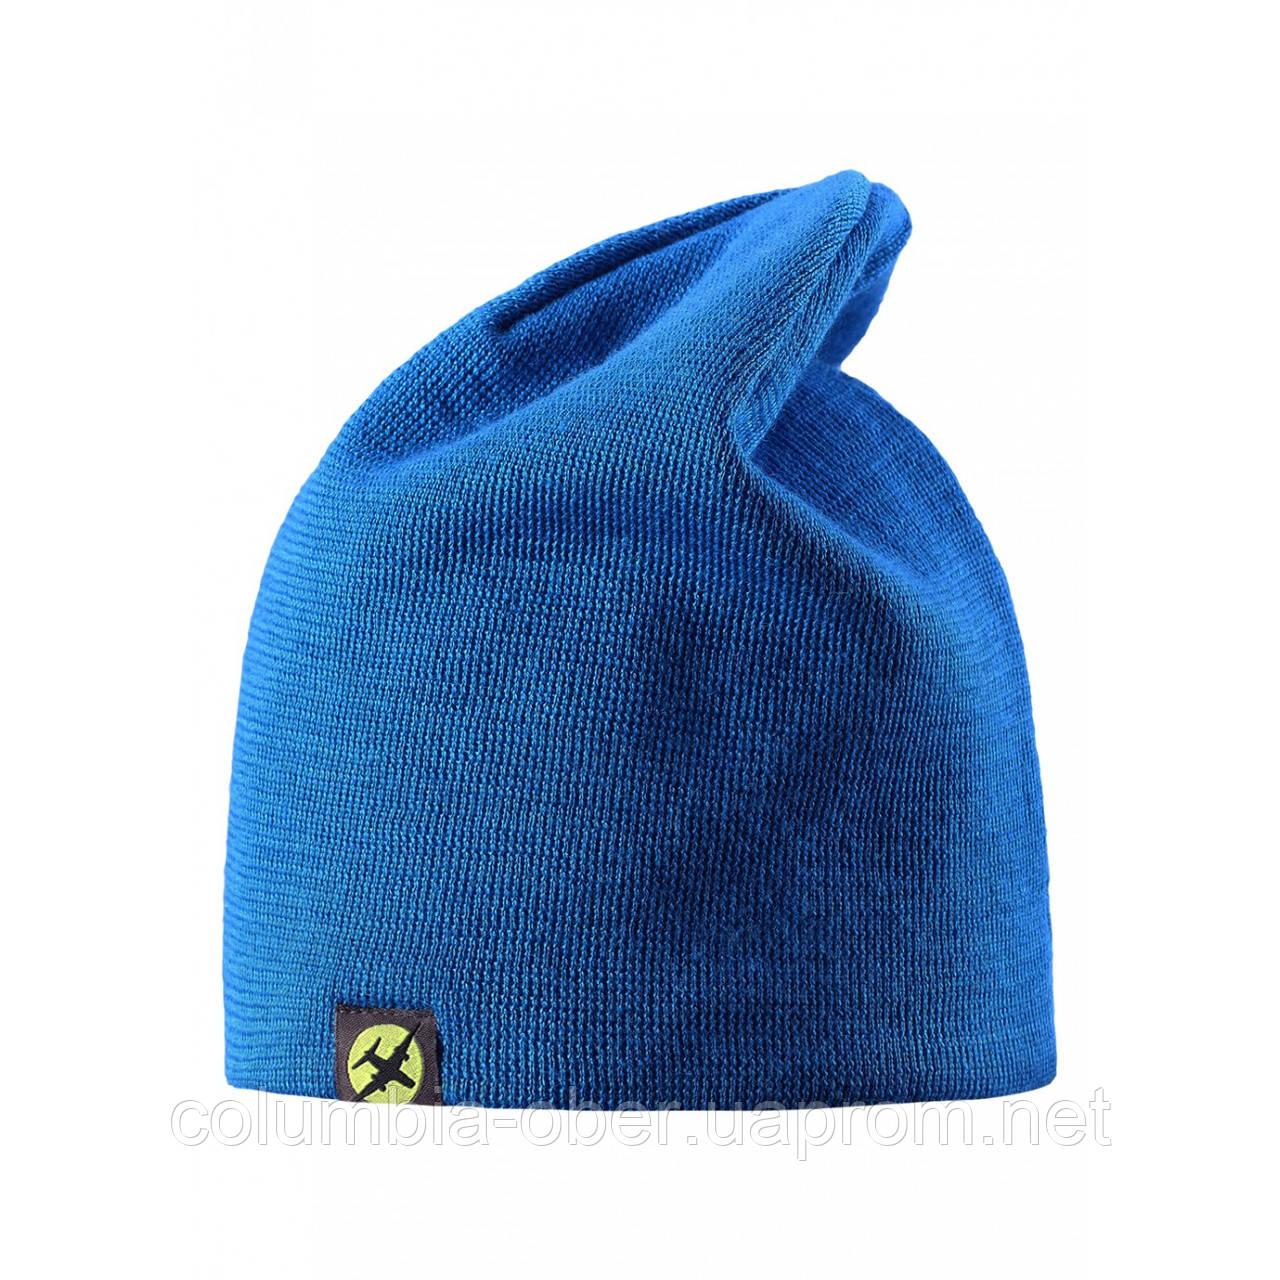 Зимняя шапка для мальчика Lassie by Reima 728694 - 6510. Размер S, М и L.